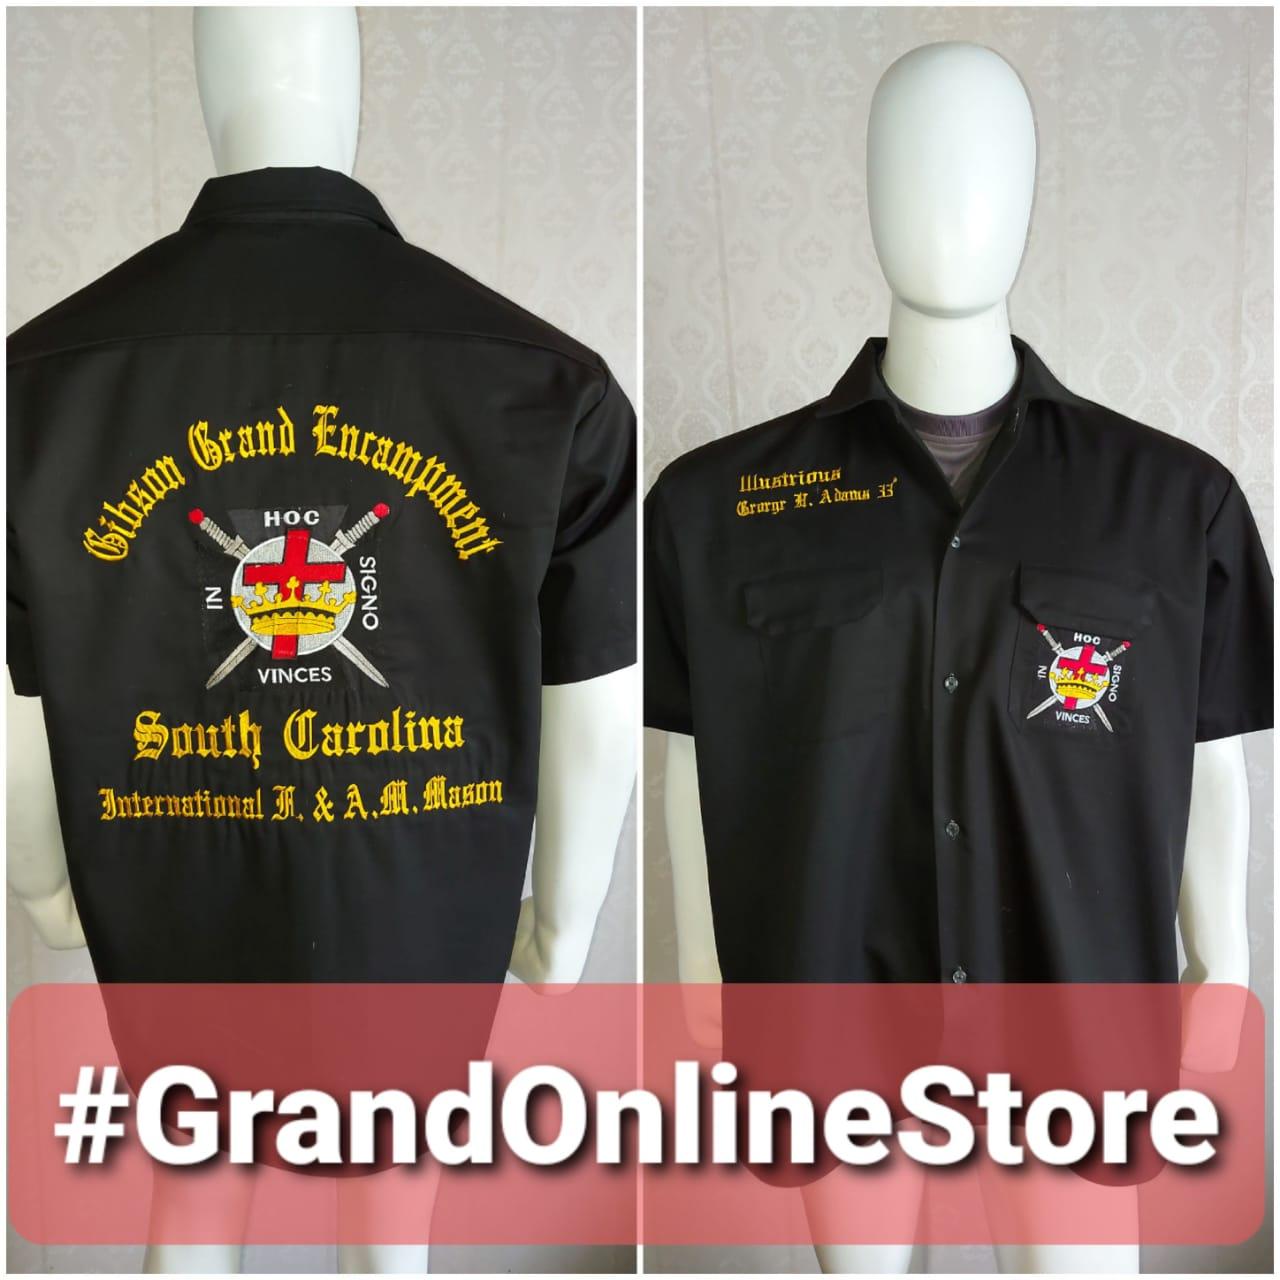 Knight Templar Shirt, KT Shirt Emrboidered Shirt